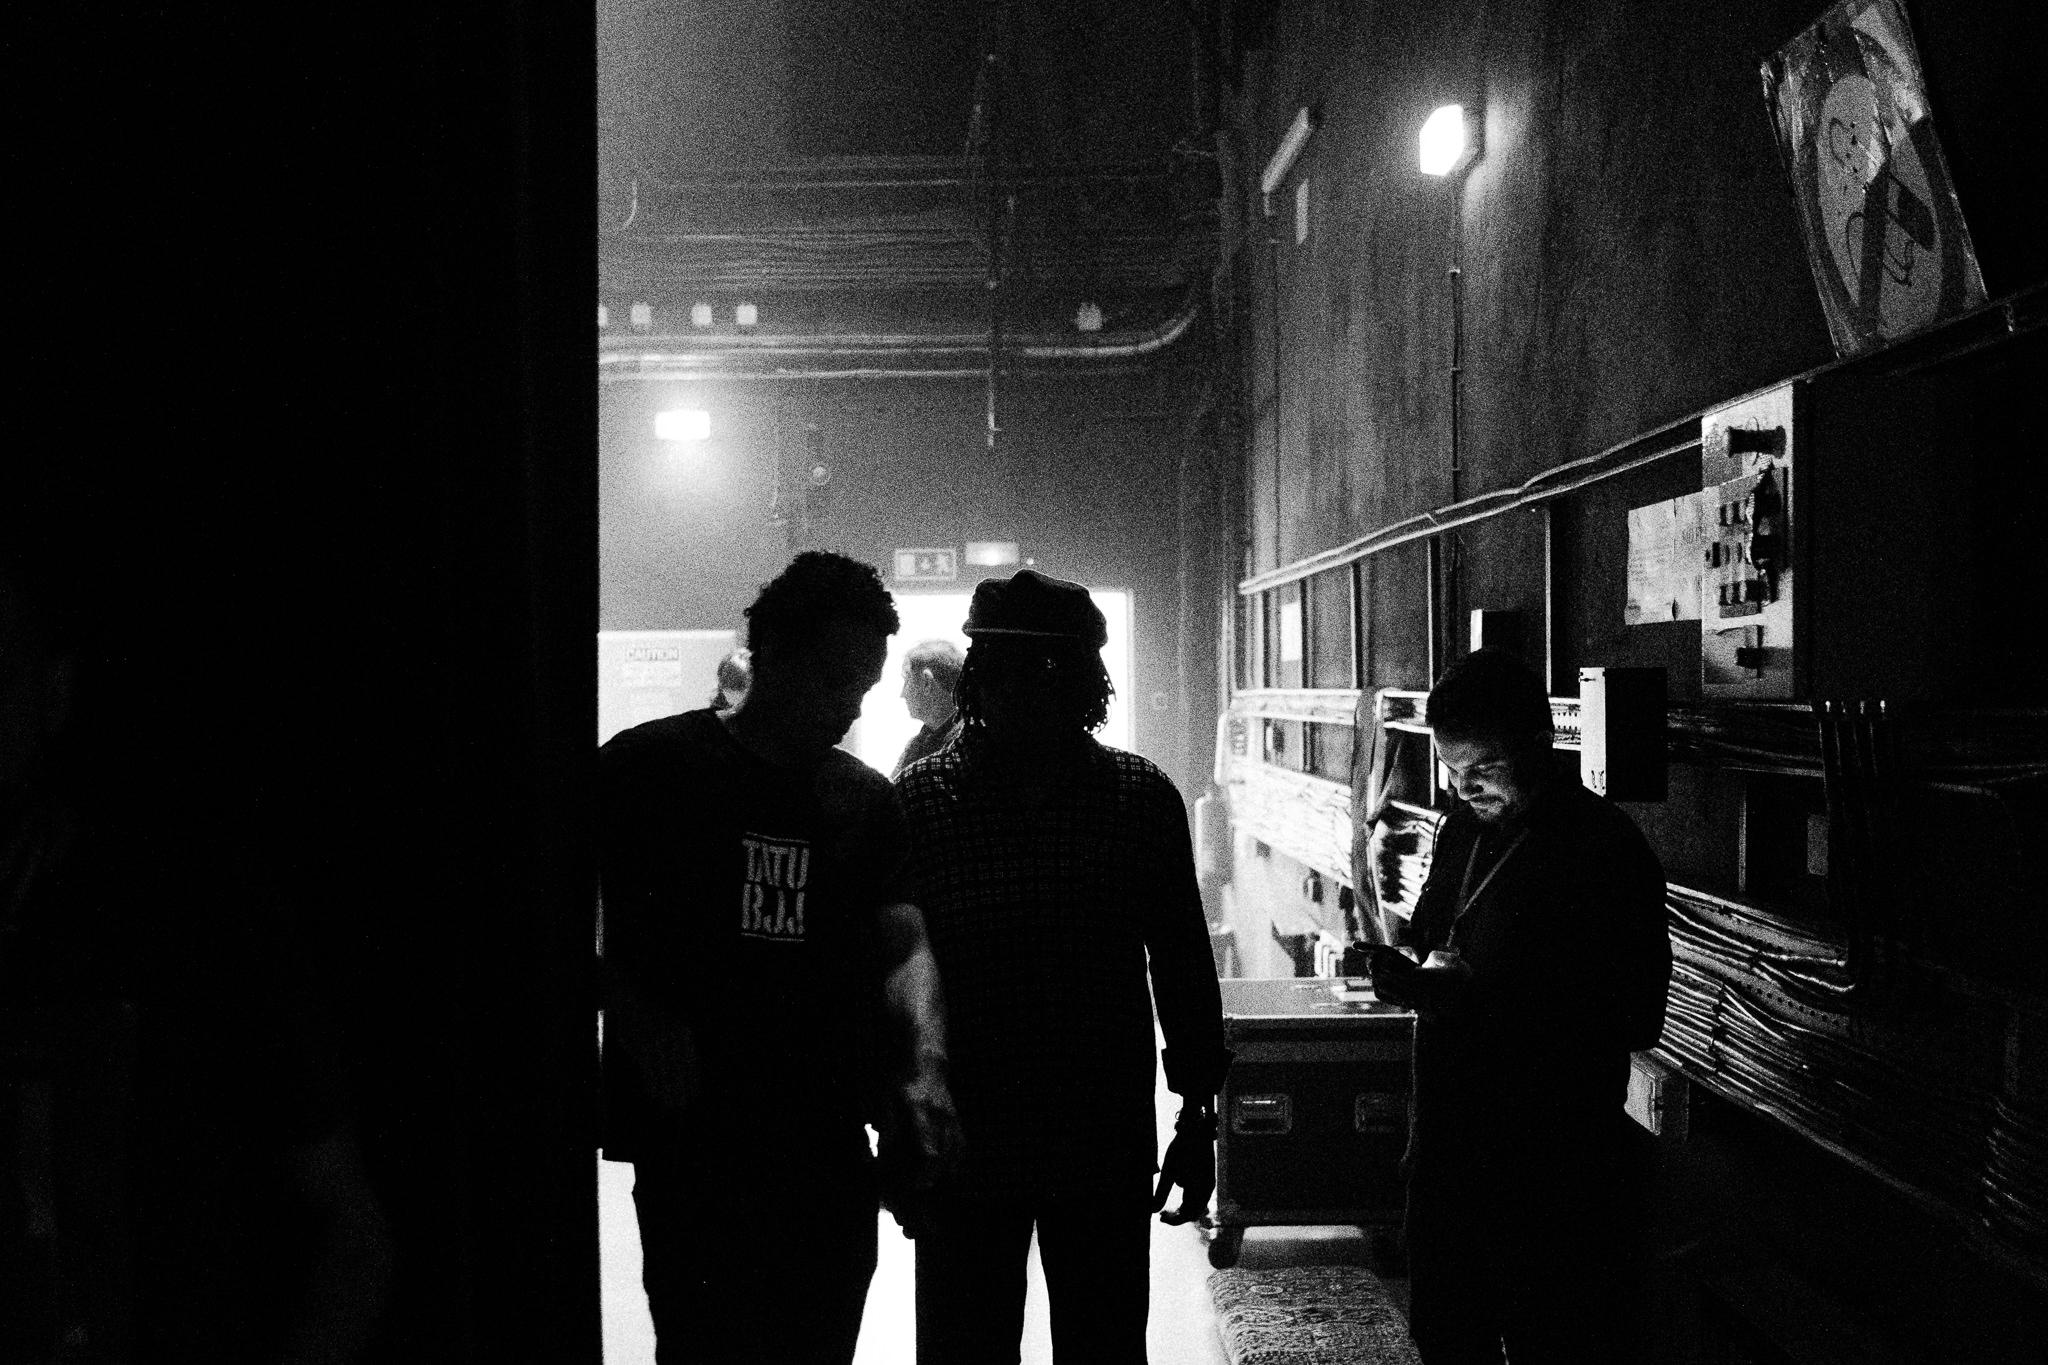 Milton Nascimento - Coliseu (Thrall Photography) - 0008.jpg